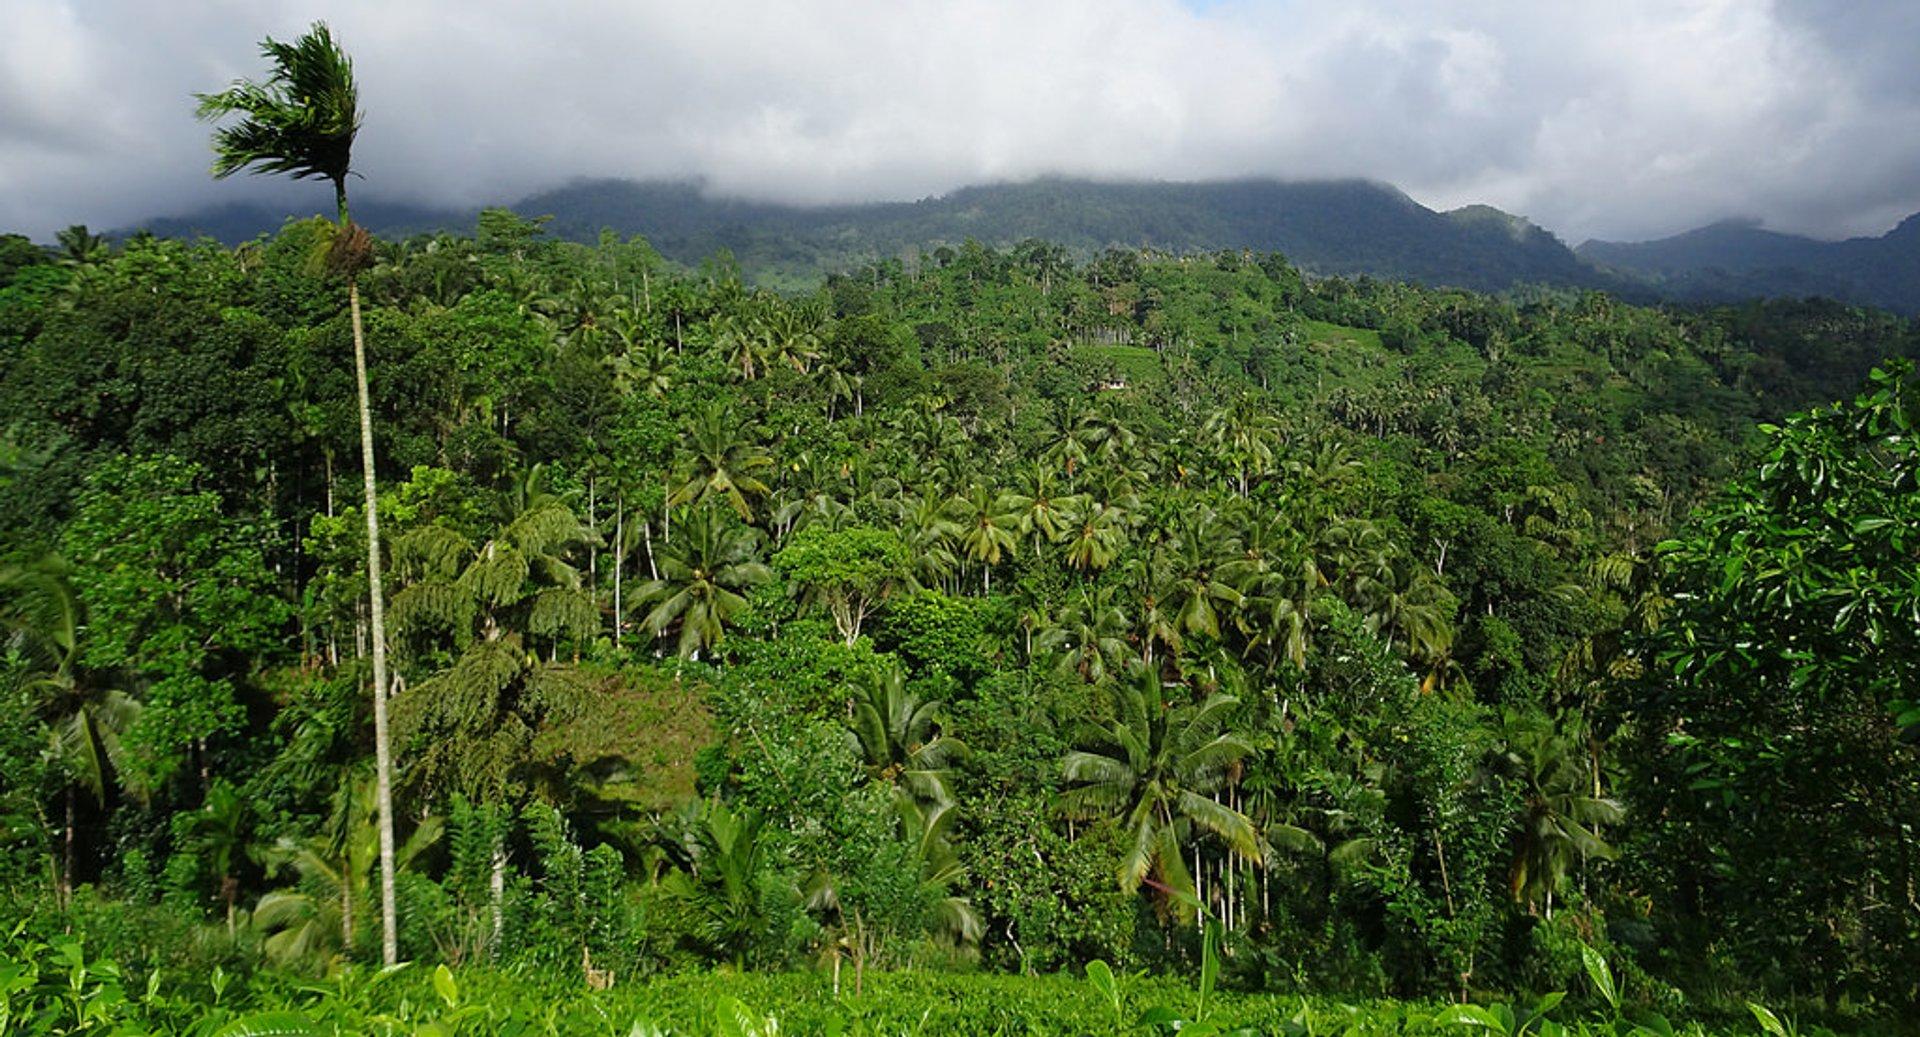 Sinharaja Rainforest in Sri Lanka - Best Season 2020